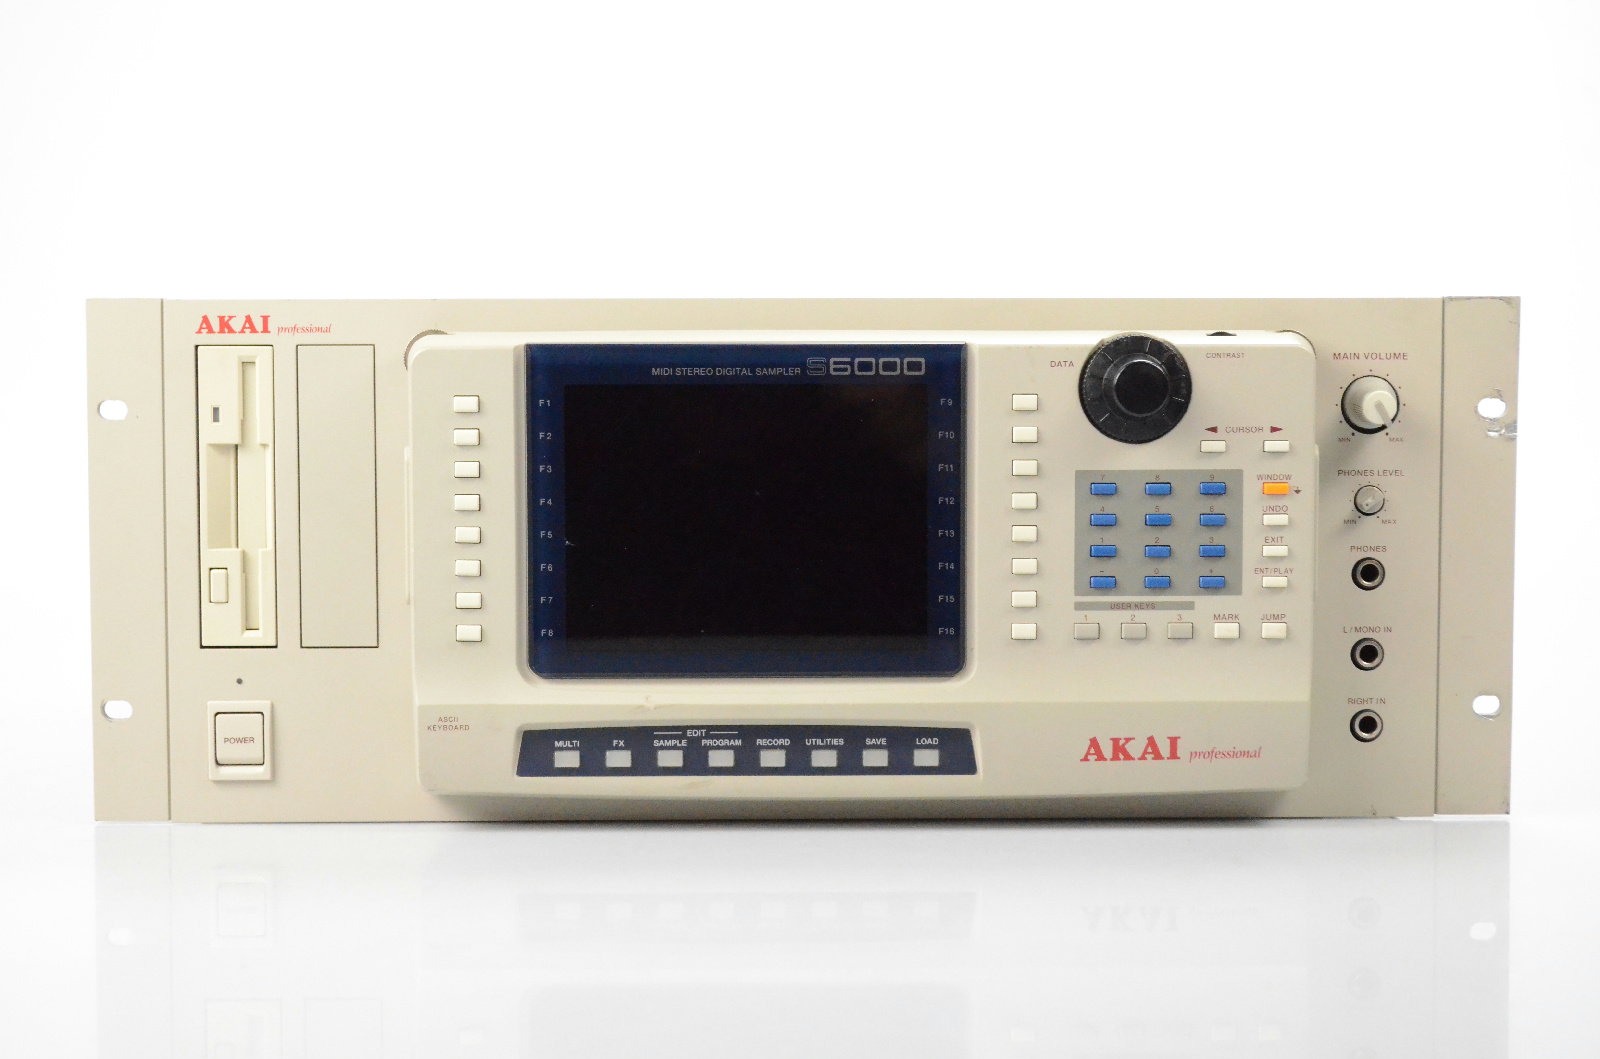 Akai S6000 MIDI Stereo Digital Sampler w/ Manual 256Mb 2.11a S 6000 #32051